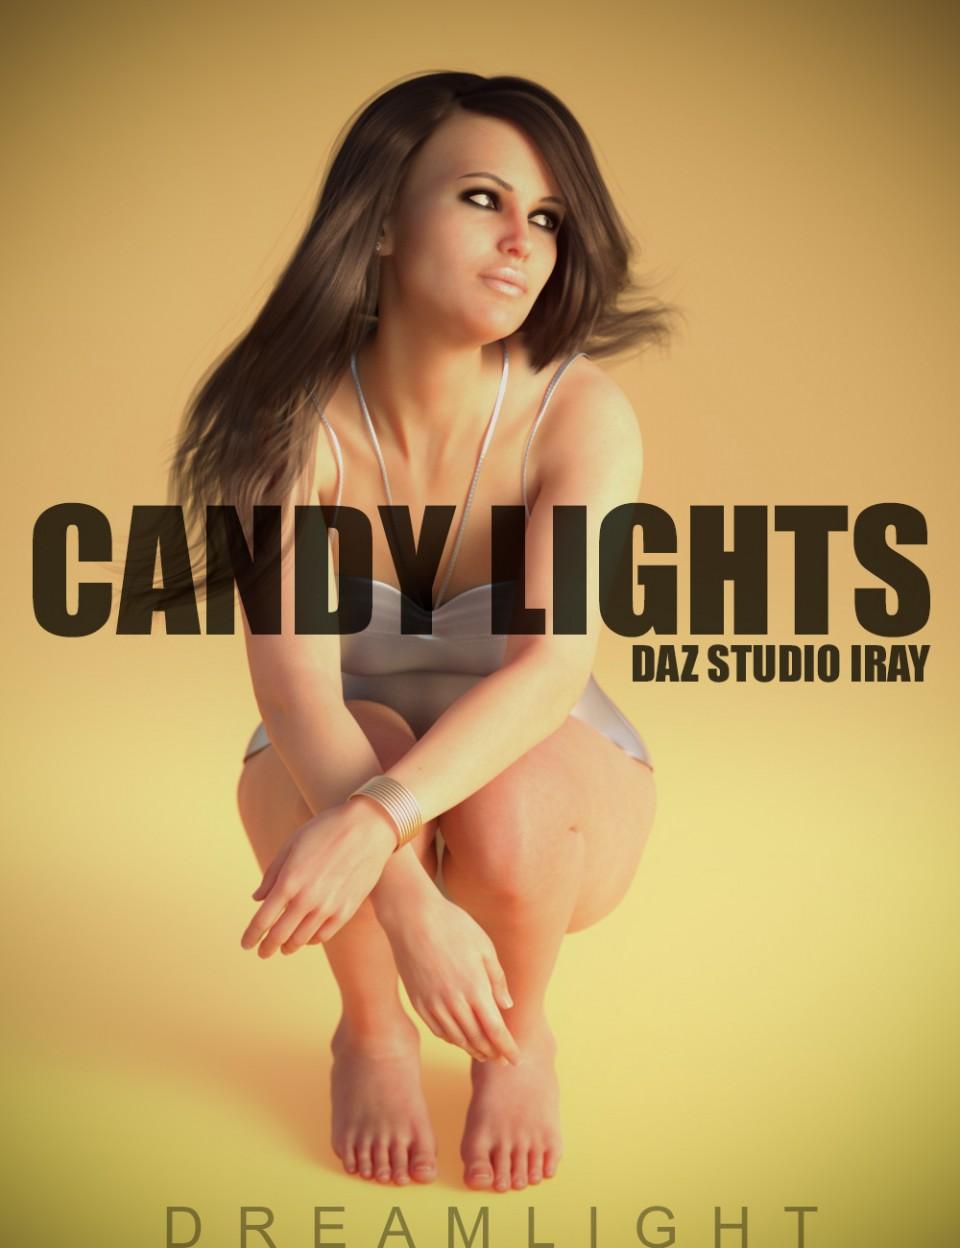 candy-lights-–-daz-studio-iray